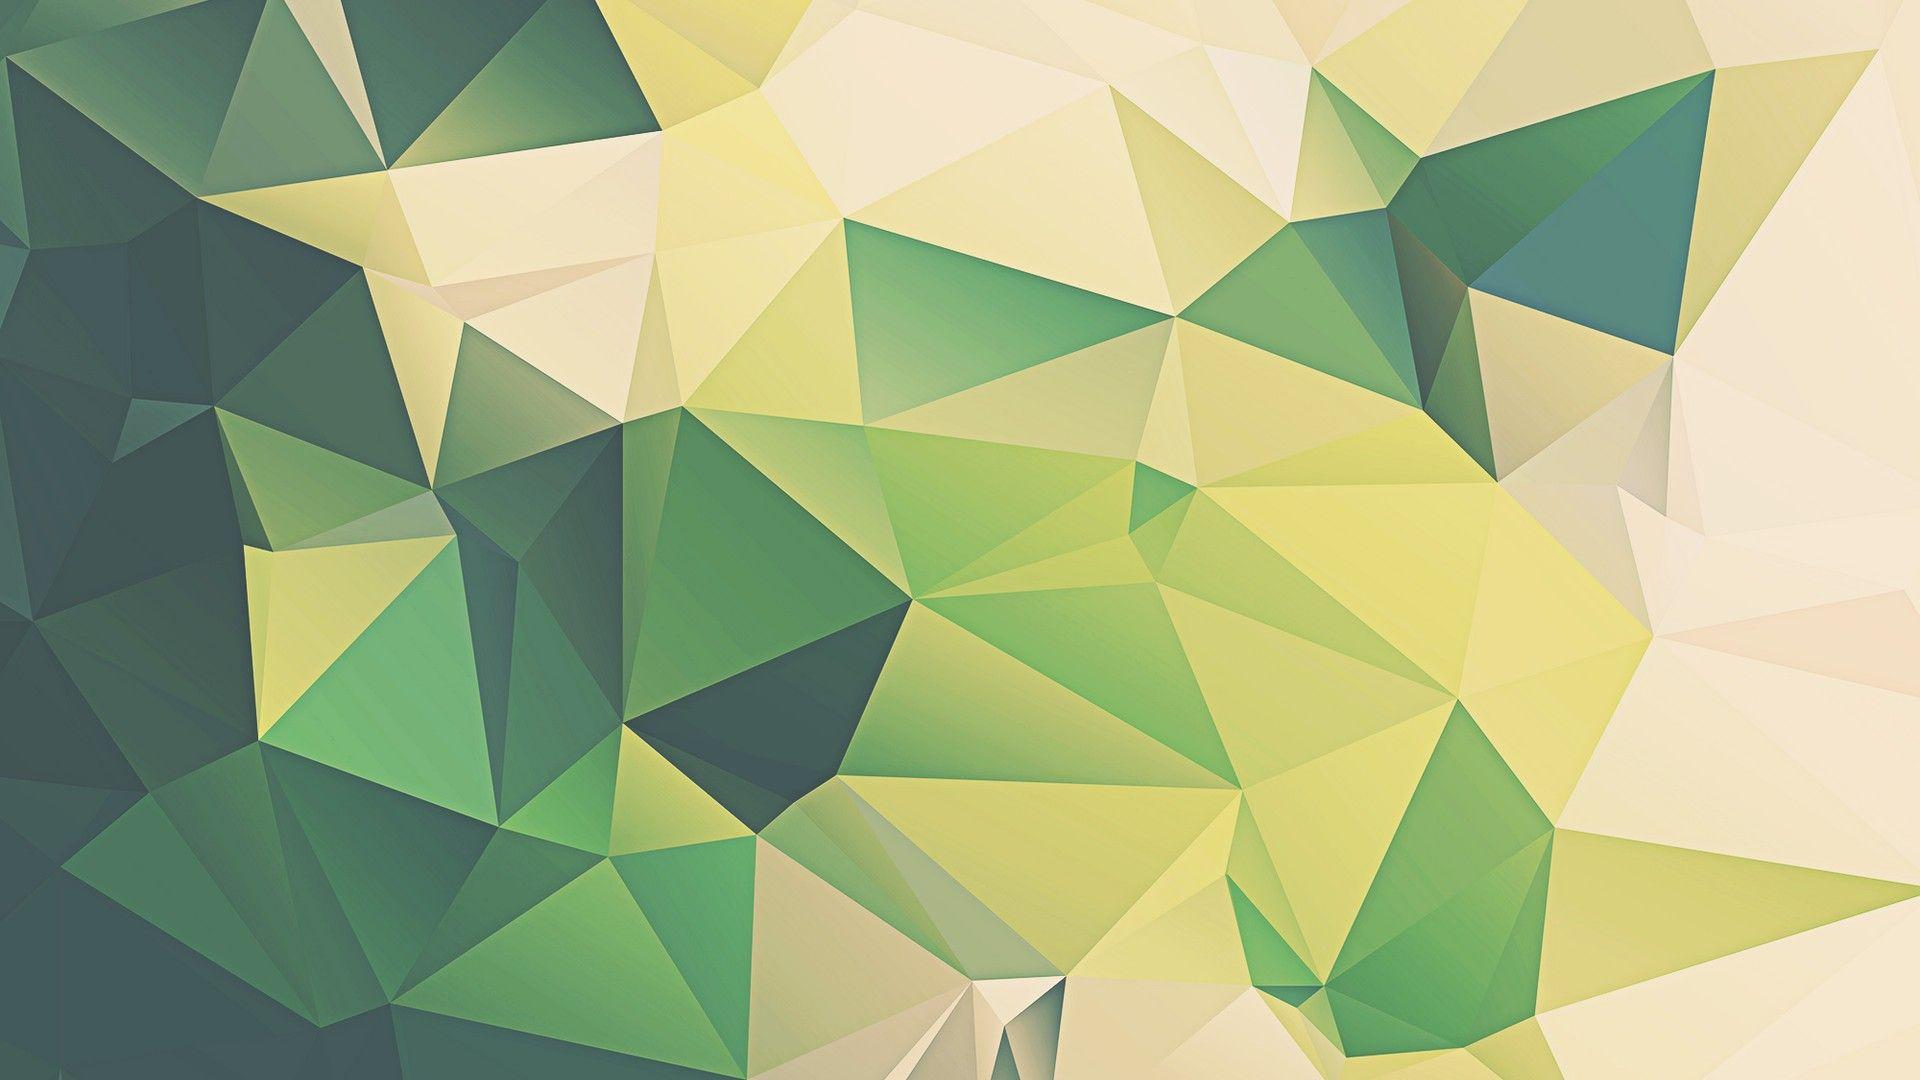 Green Colour Desktop Backgrounds Hd Abstract Geometric Art